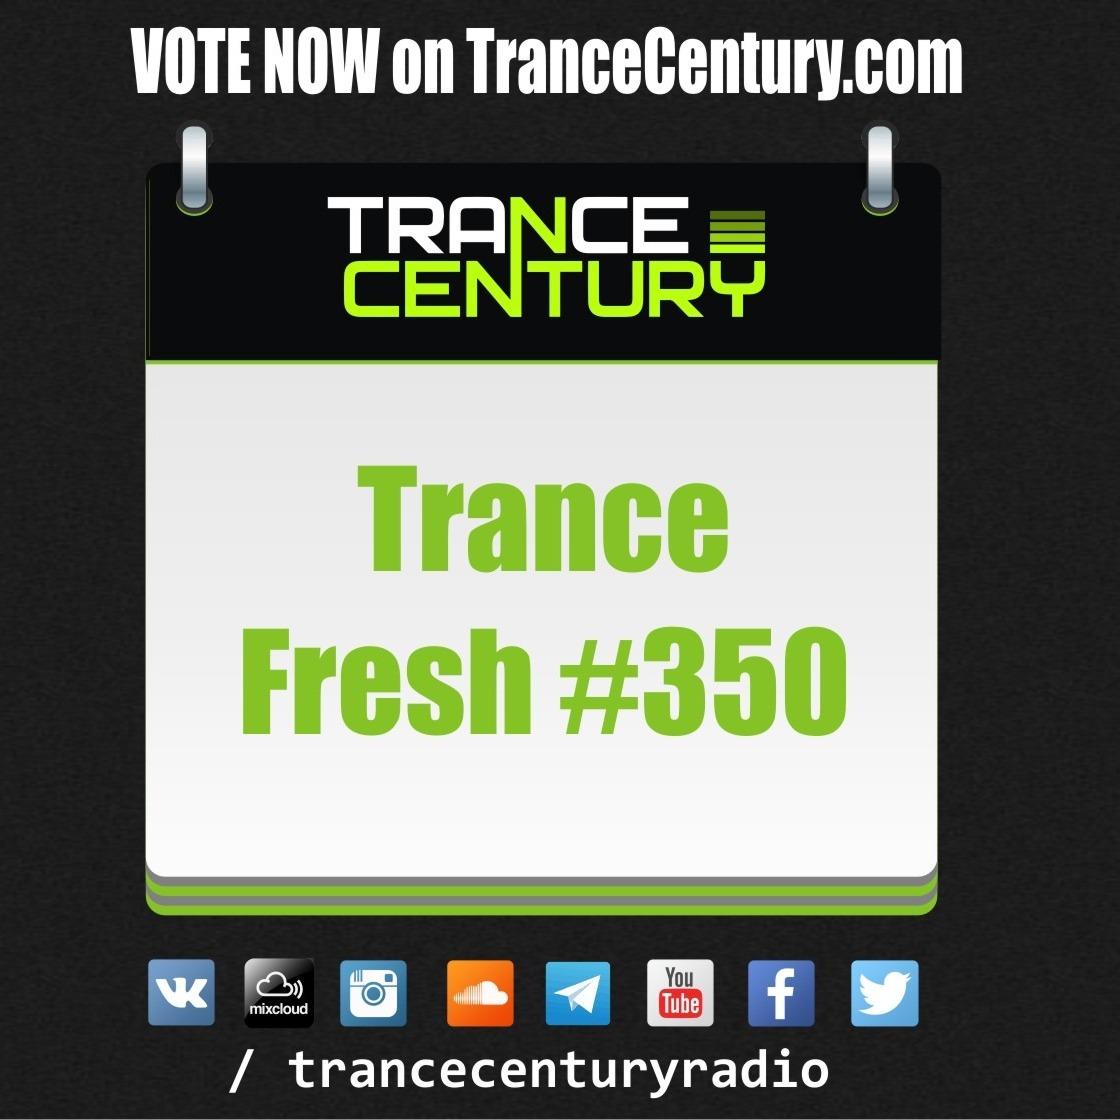 Trance Century Radio - RadioShow #TranceFresh 350